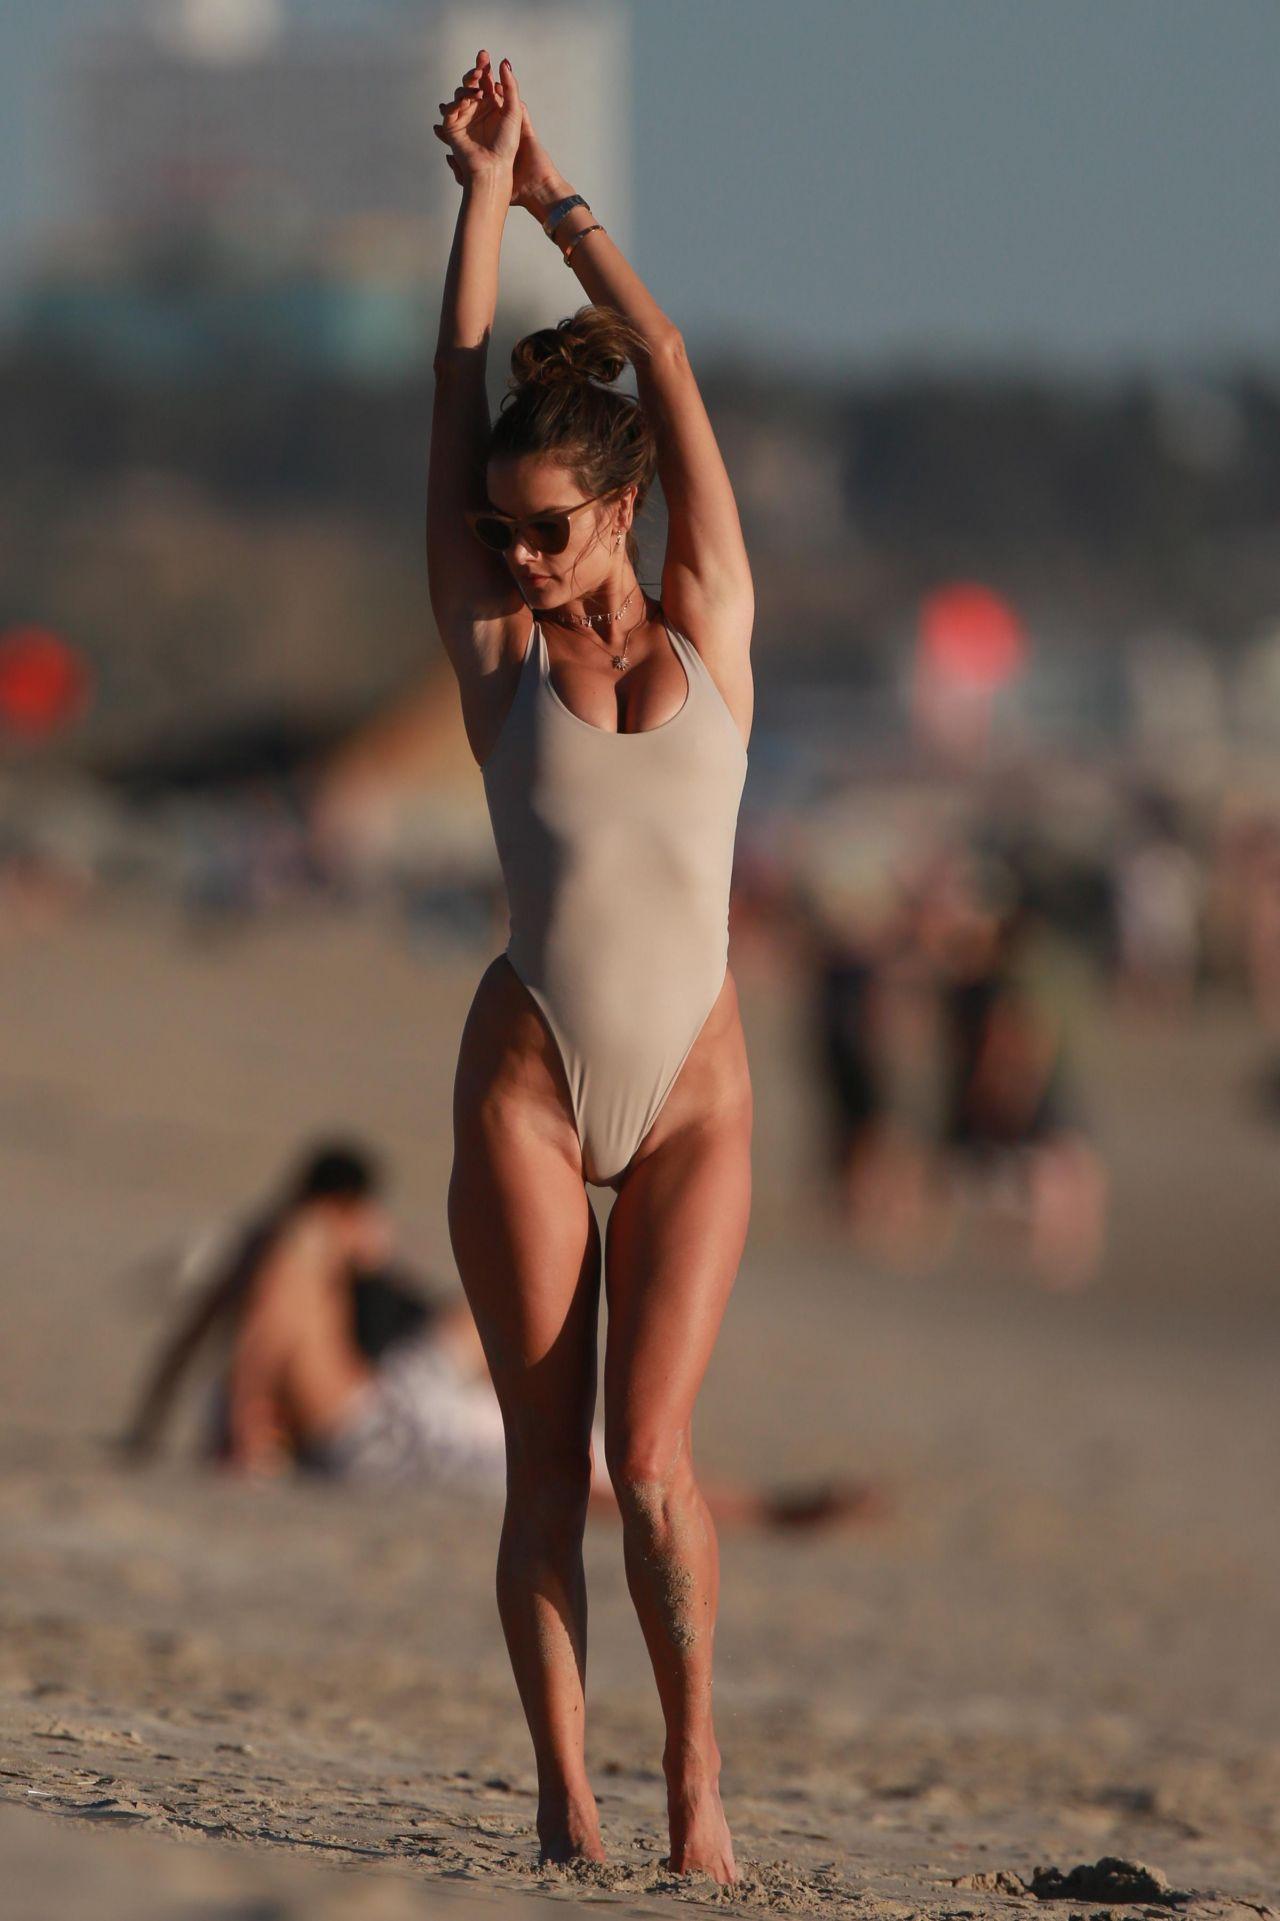 Alessandra Ambrosio In Bikini At The Beach In Malibu 0128 -7174